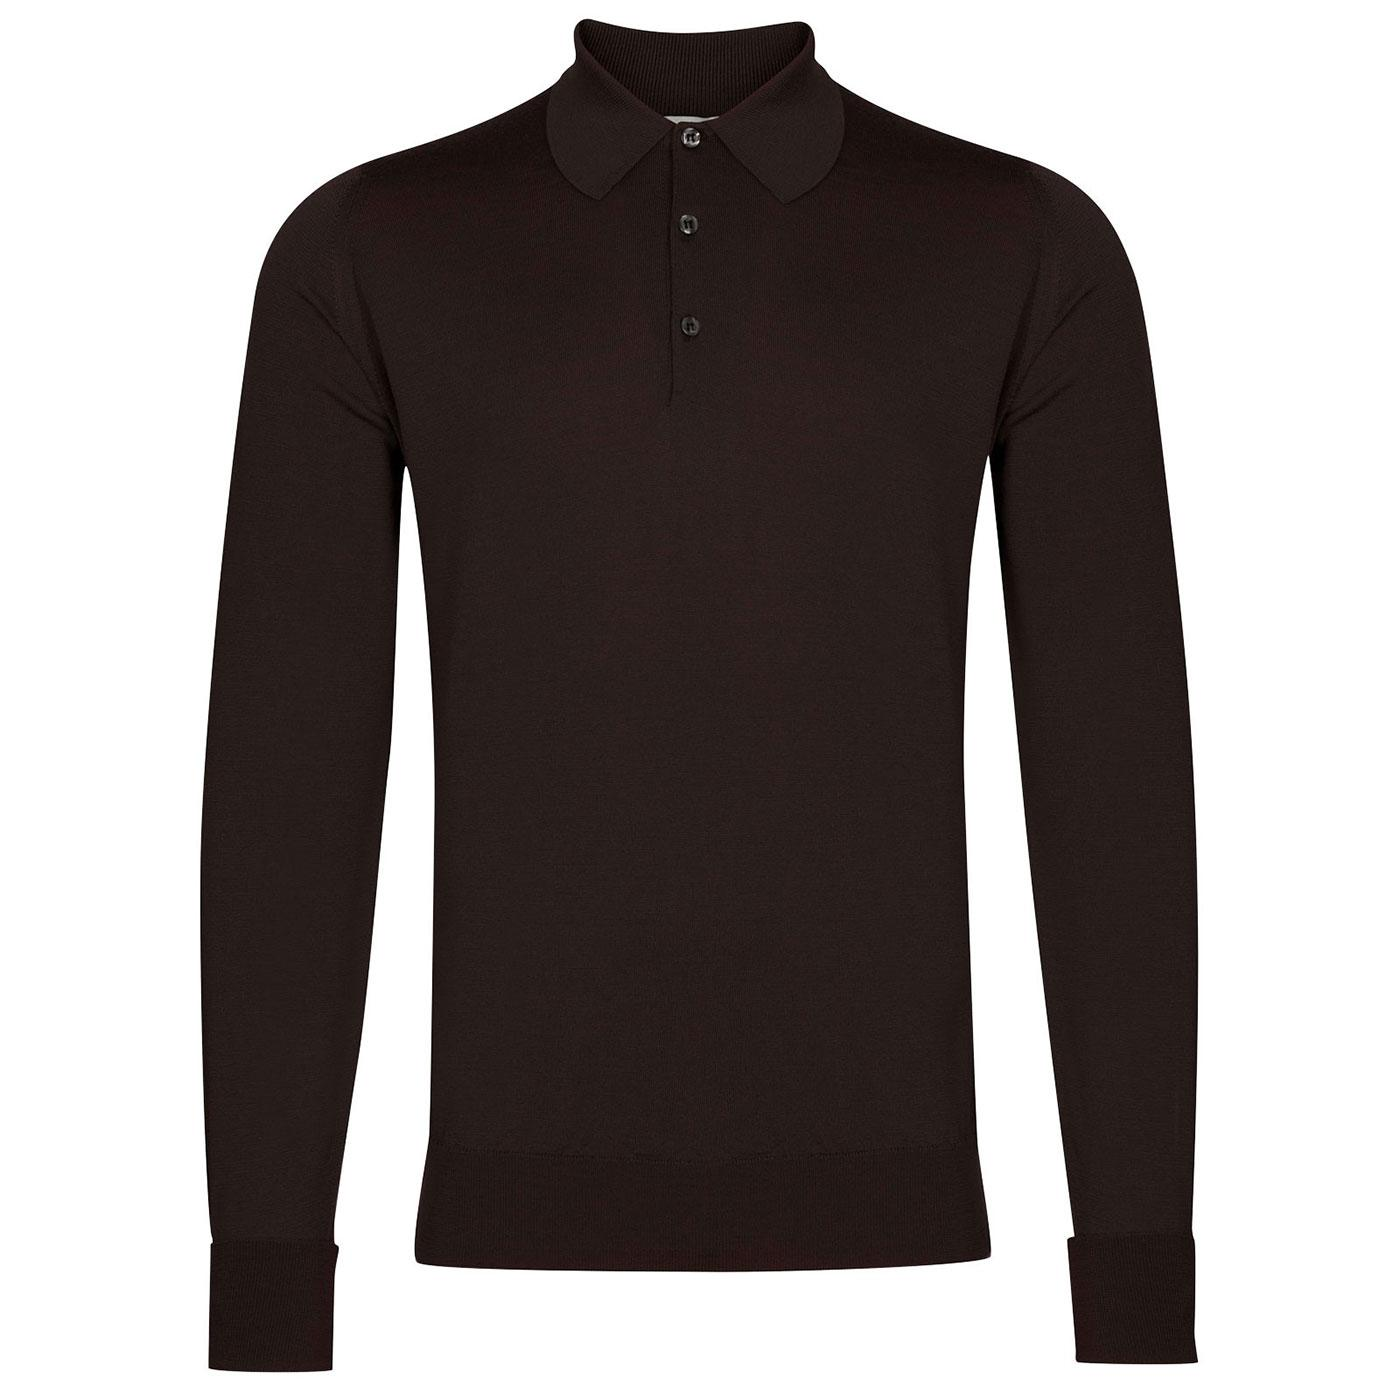 Dorset JOHN SMEDLEY Knitted Wool Mod Polo Shirt DC